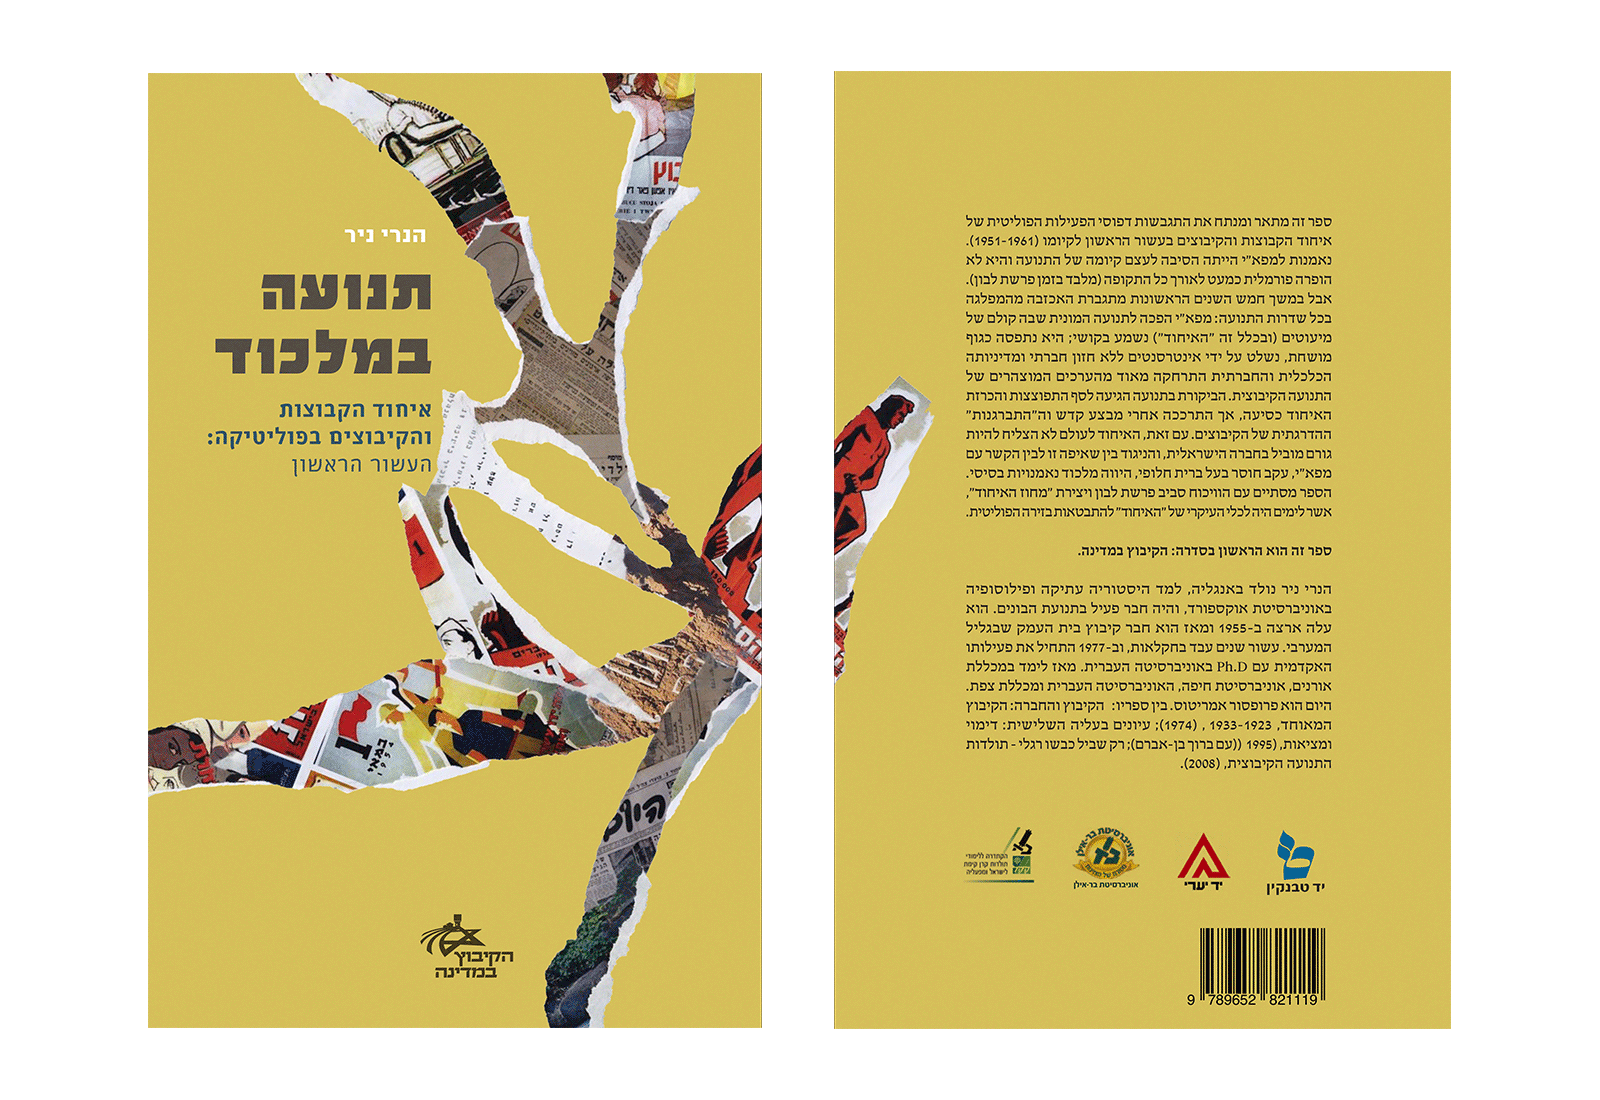 https://bigeyes.co.il/wp-content/uploads/2019/08/kibbutz-books-3.png